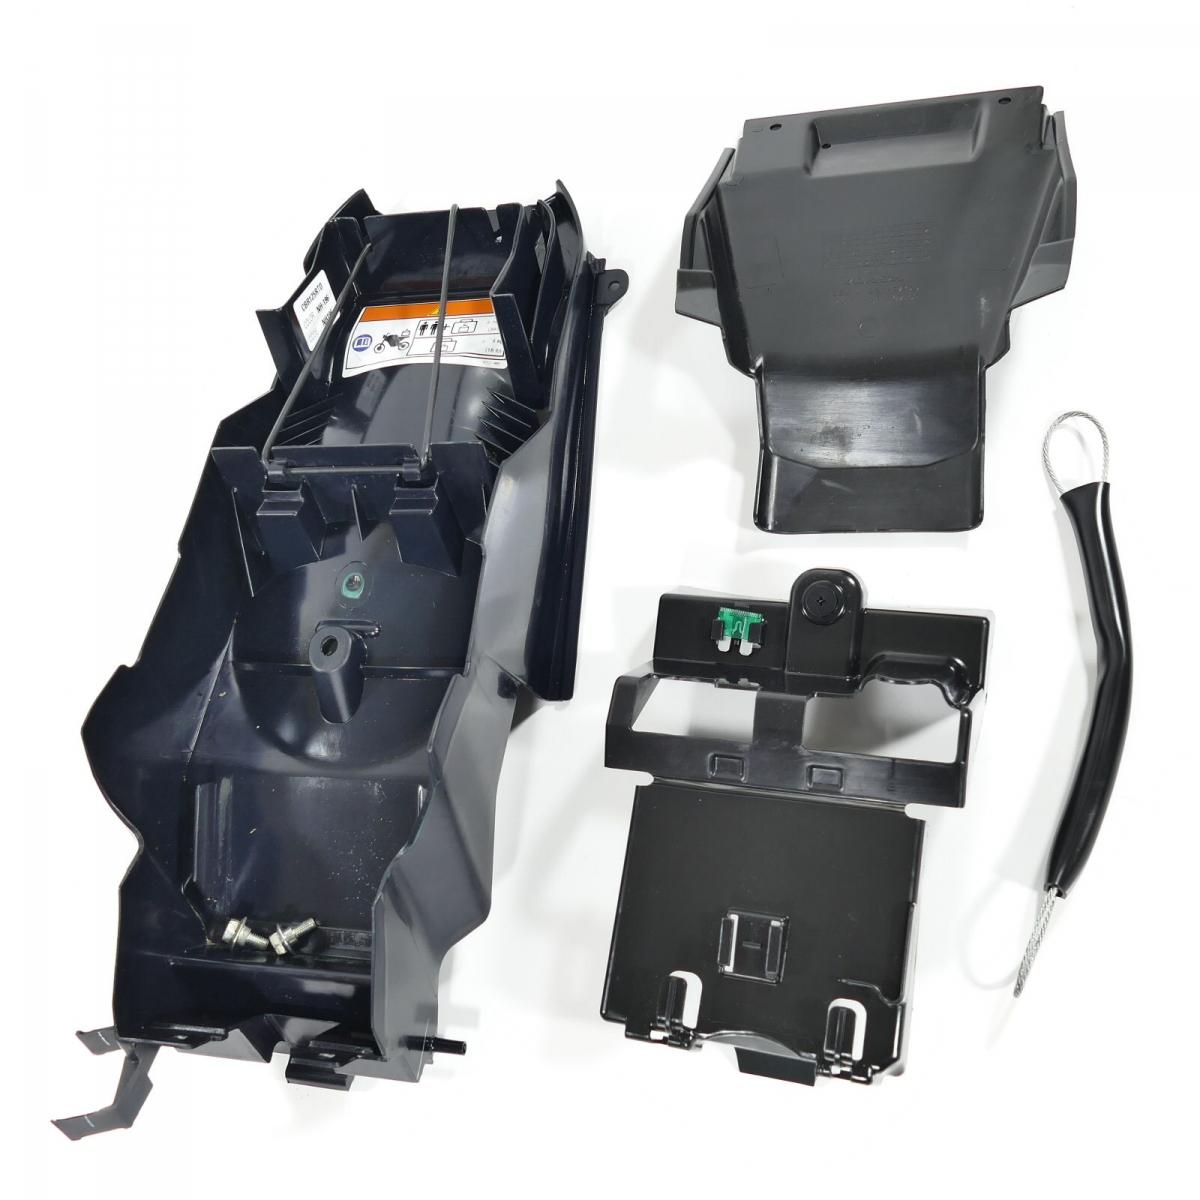 honda cbr125r jc50 heckinnenverkleidung kotfl gel bn bikes. Black Bedroom Furniture Sets. Home Design Ideas